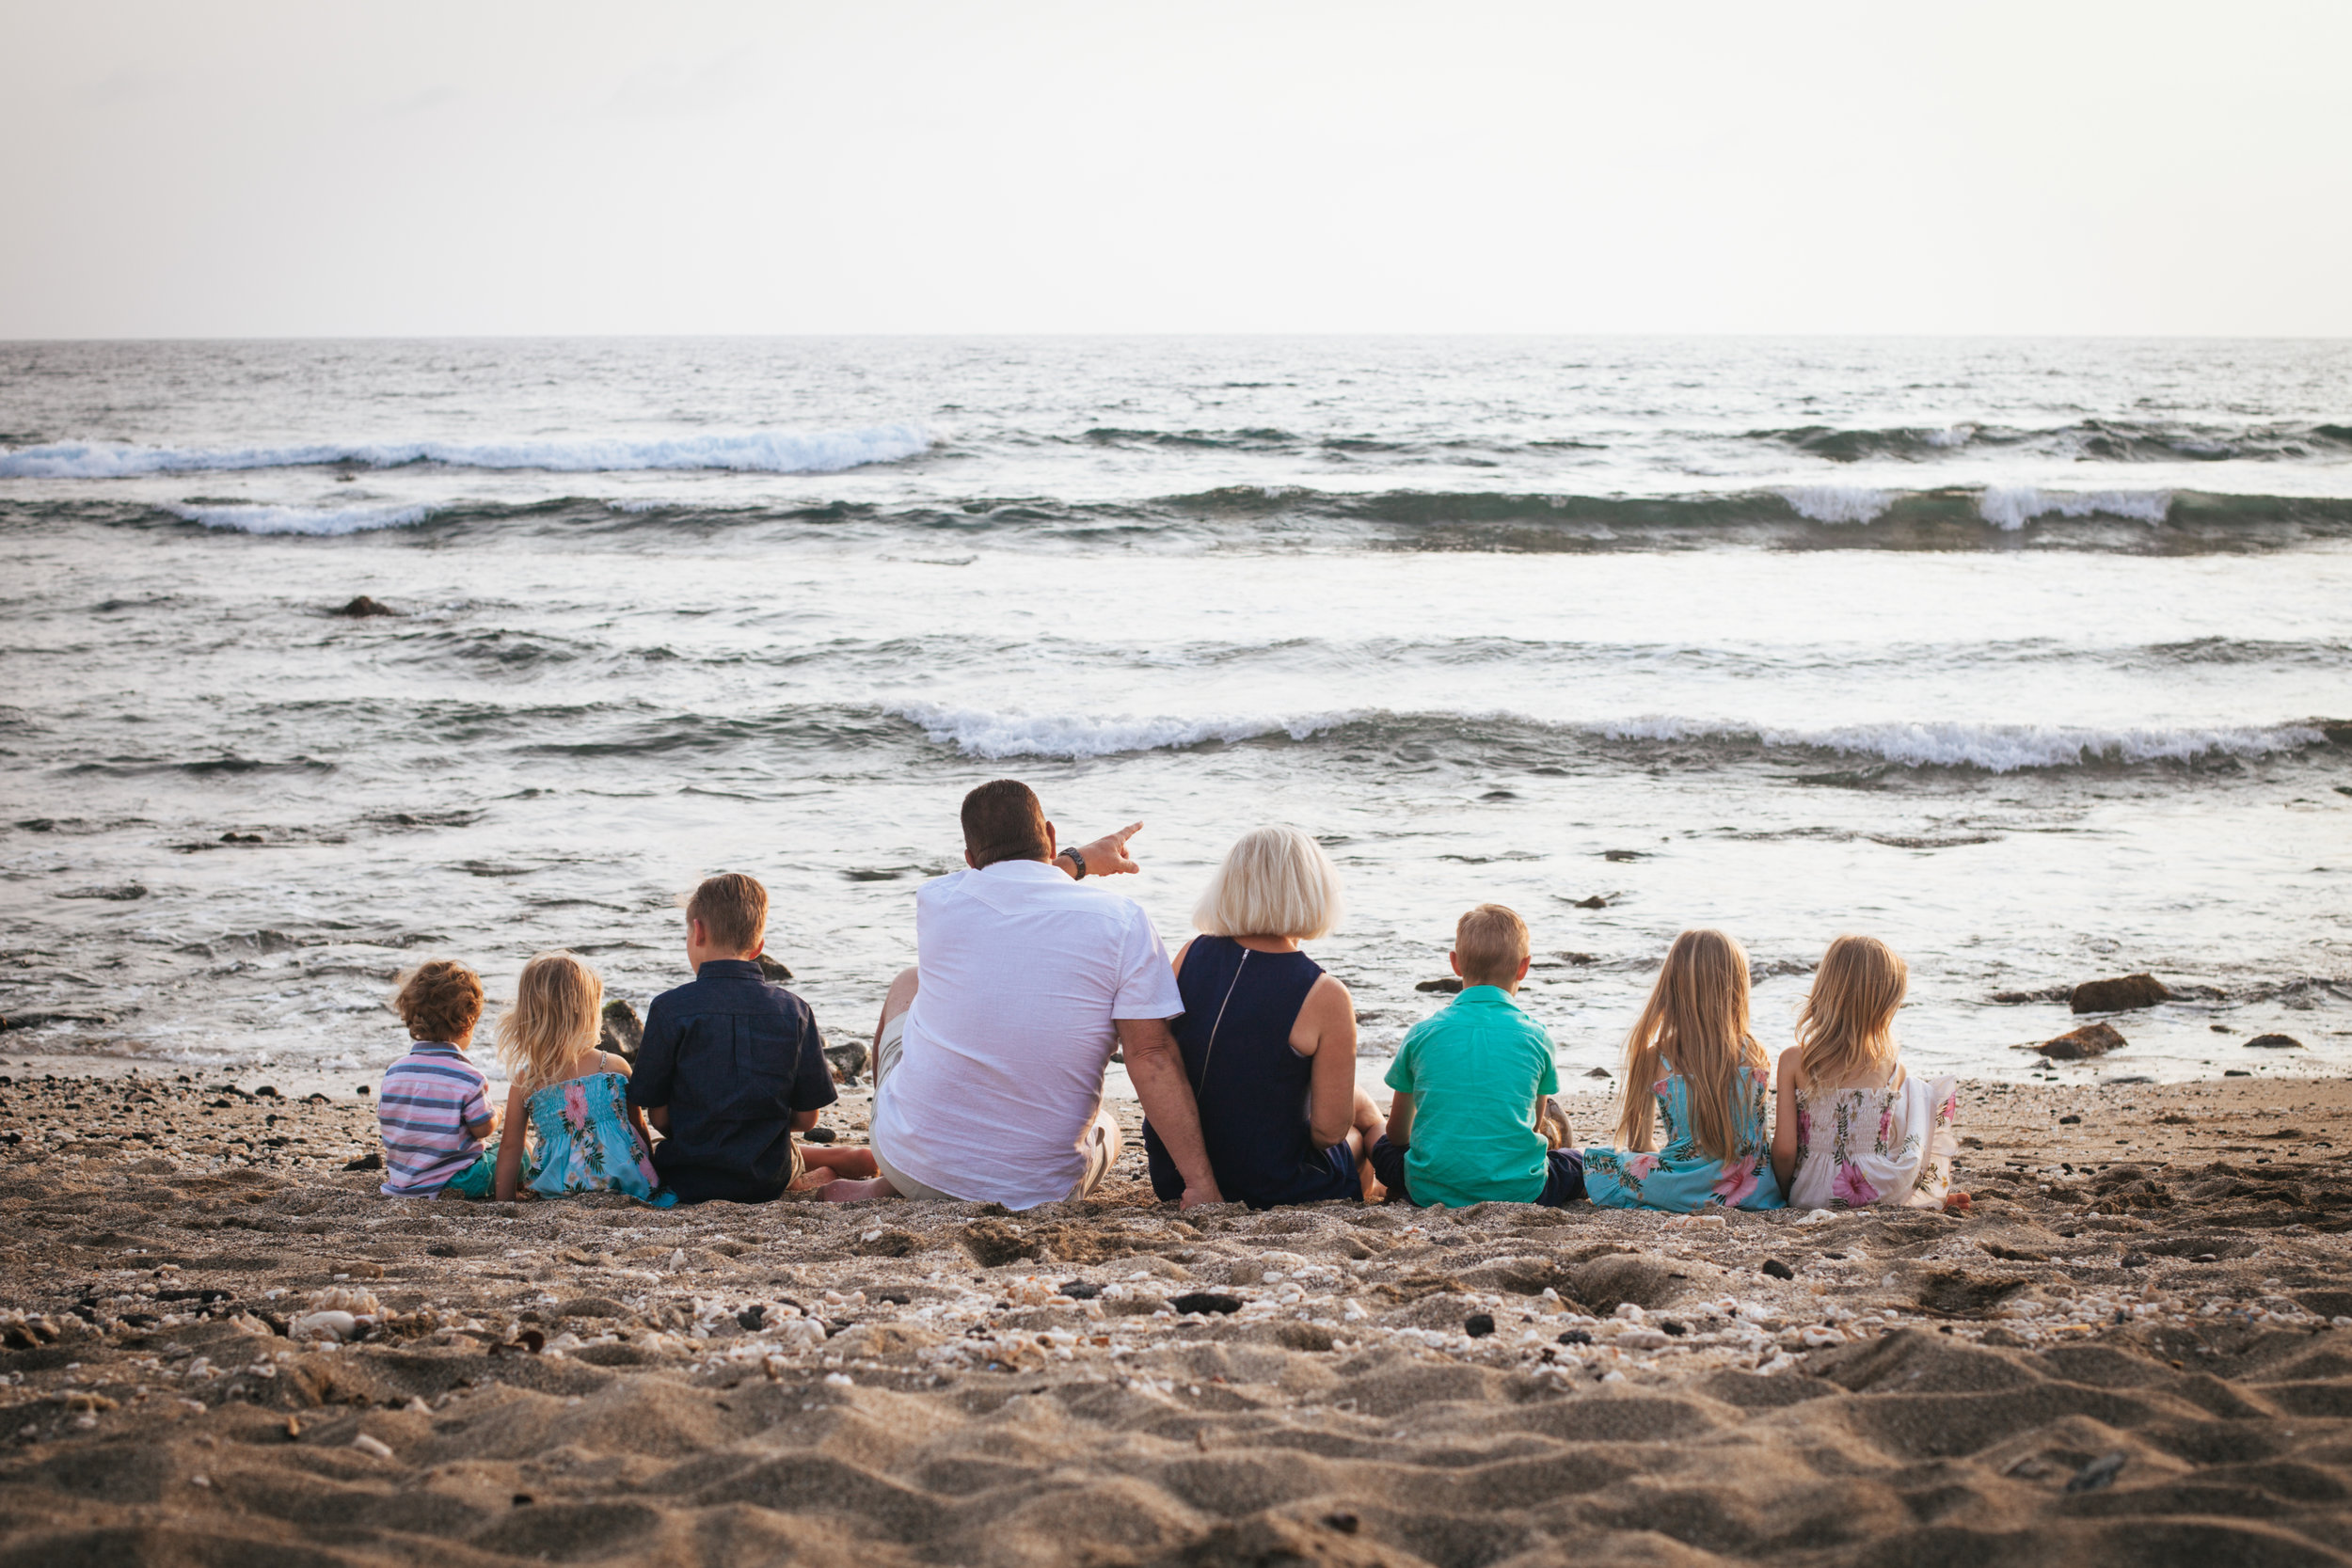 big island hawaii old kona airport beach family © kelilina photography 20170221175244.jpg